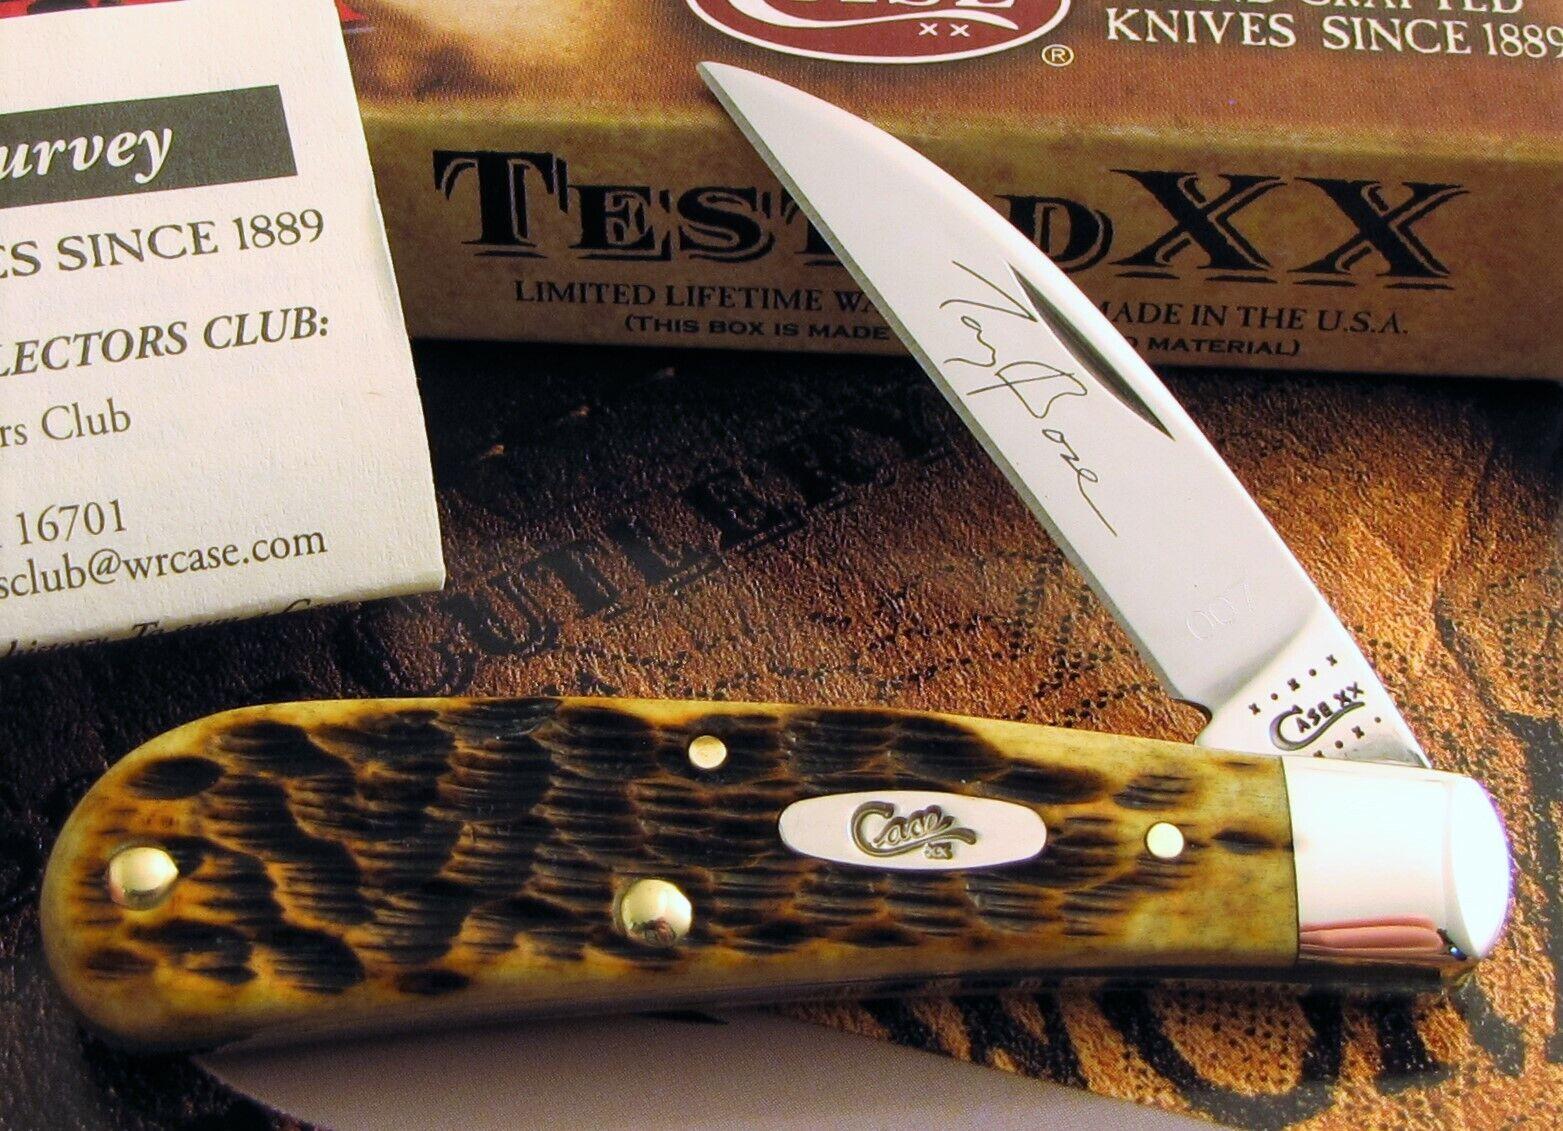 Case Sway Back Knife 2010 SFO Tony Bose Event Knife MIB & Deluxe COA 1 Of 300 NR